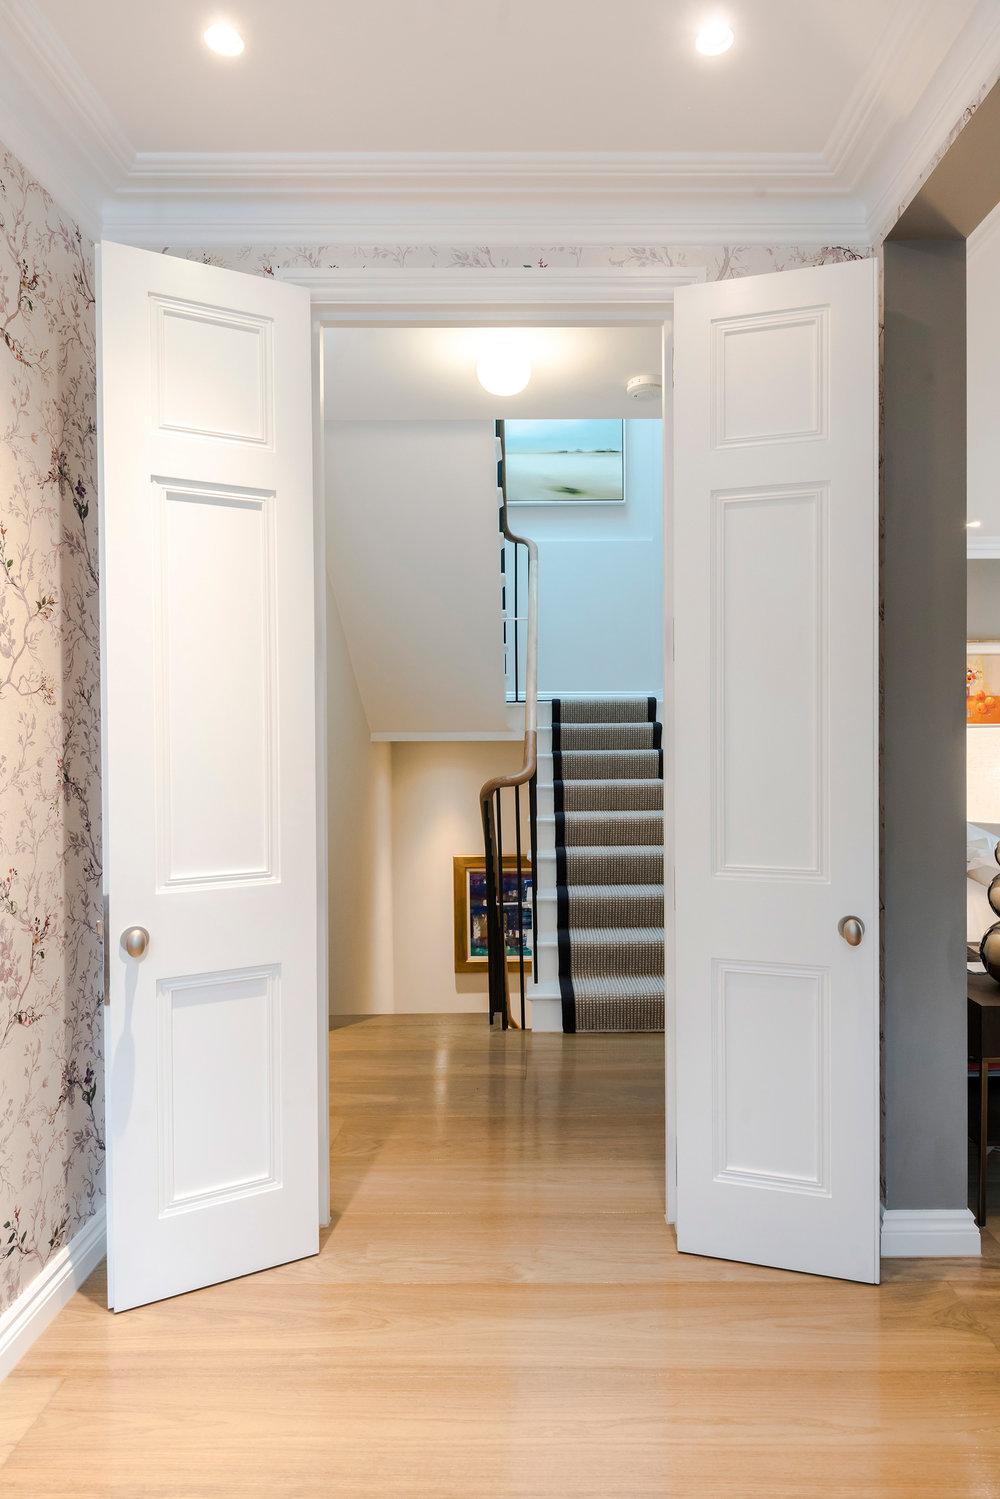 Studio 29 residential architects refurbishment kensington 4